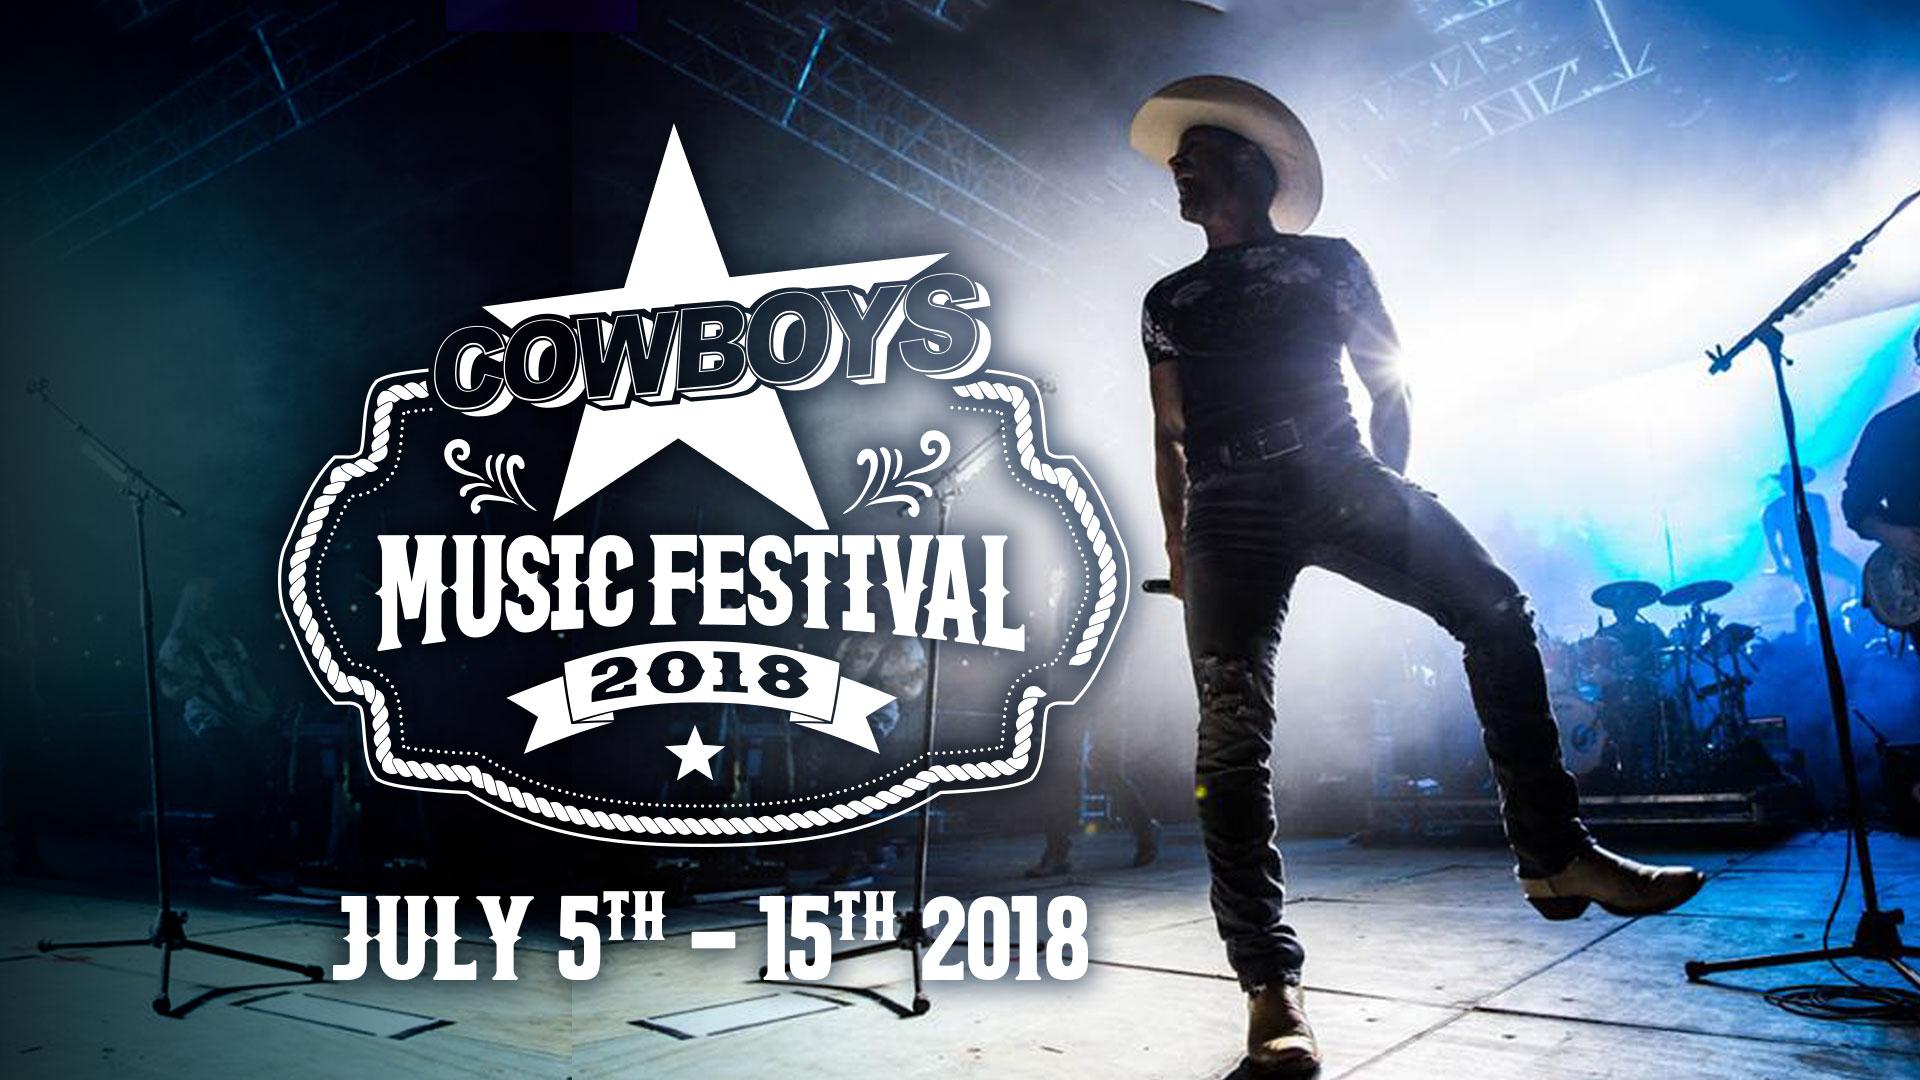 Cowboys Music Festival & Cowboys Music Festival | Showpass